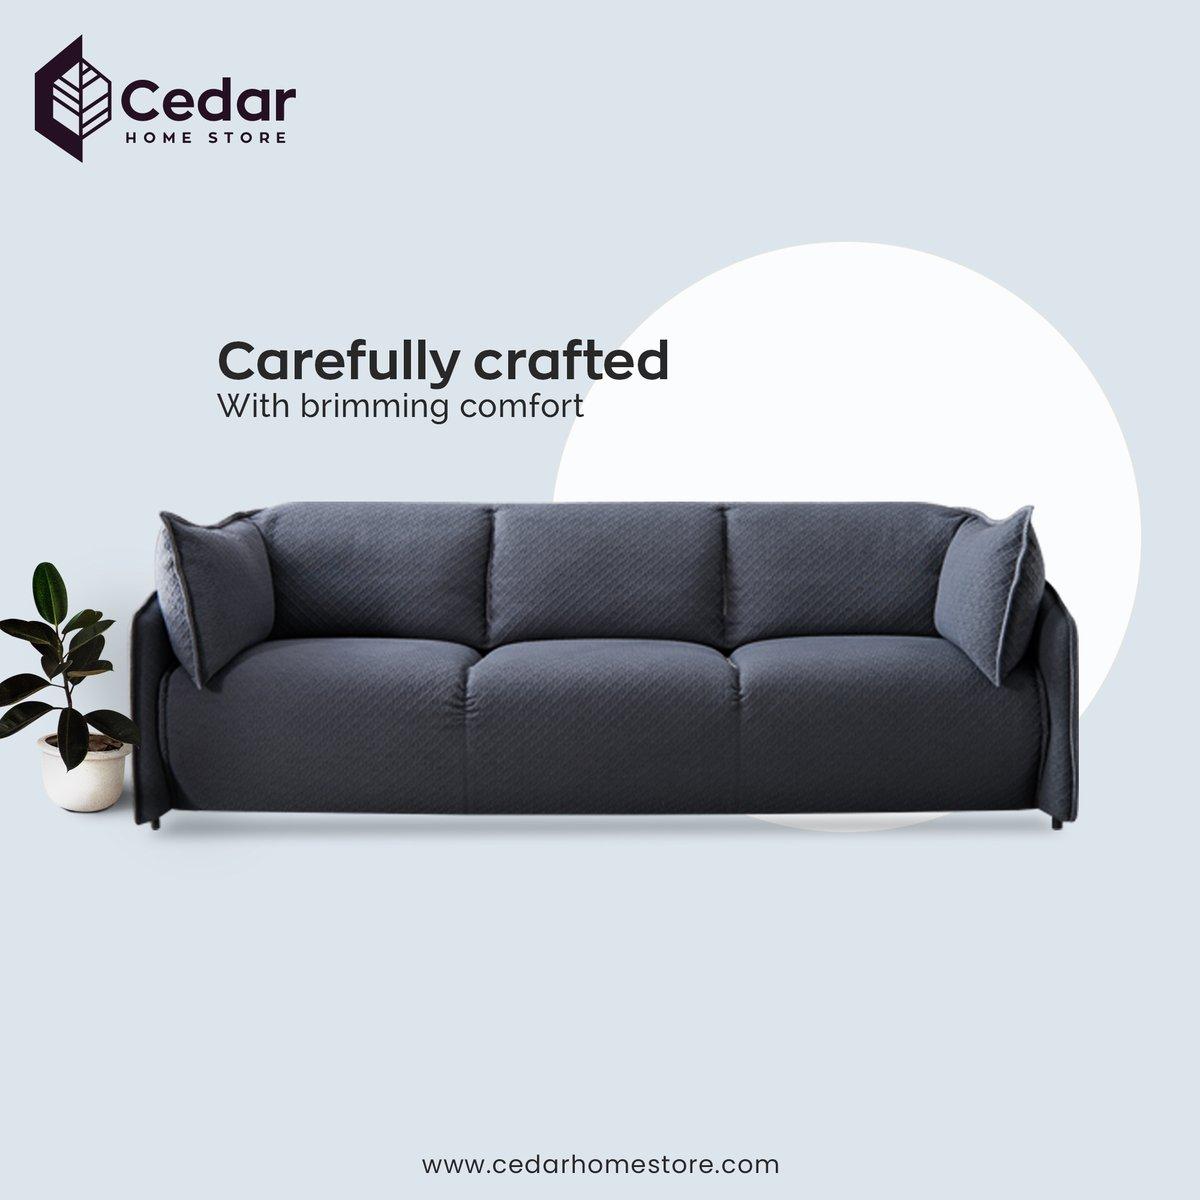 Cedar Home Store Cedarhomestore Twitter